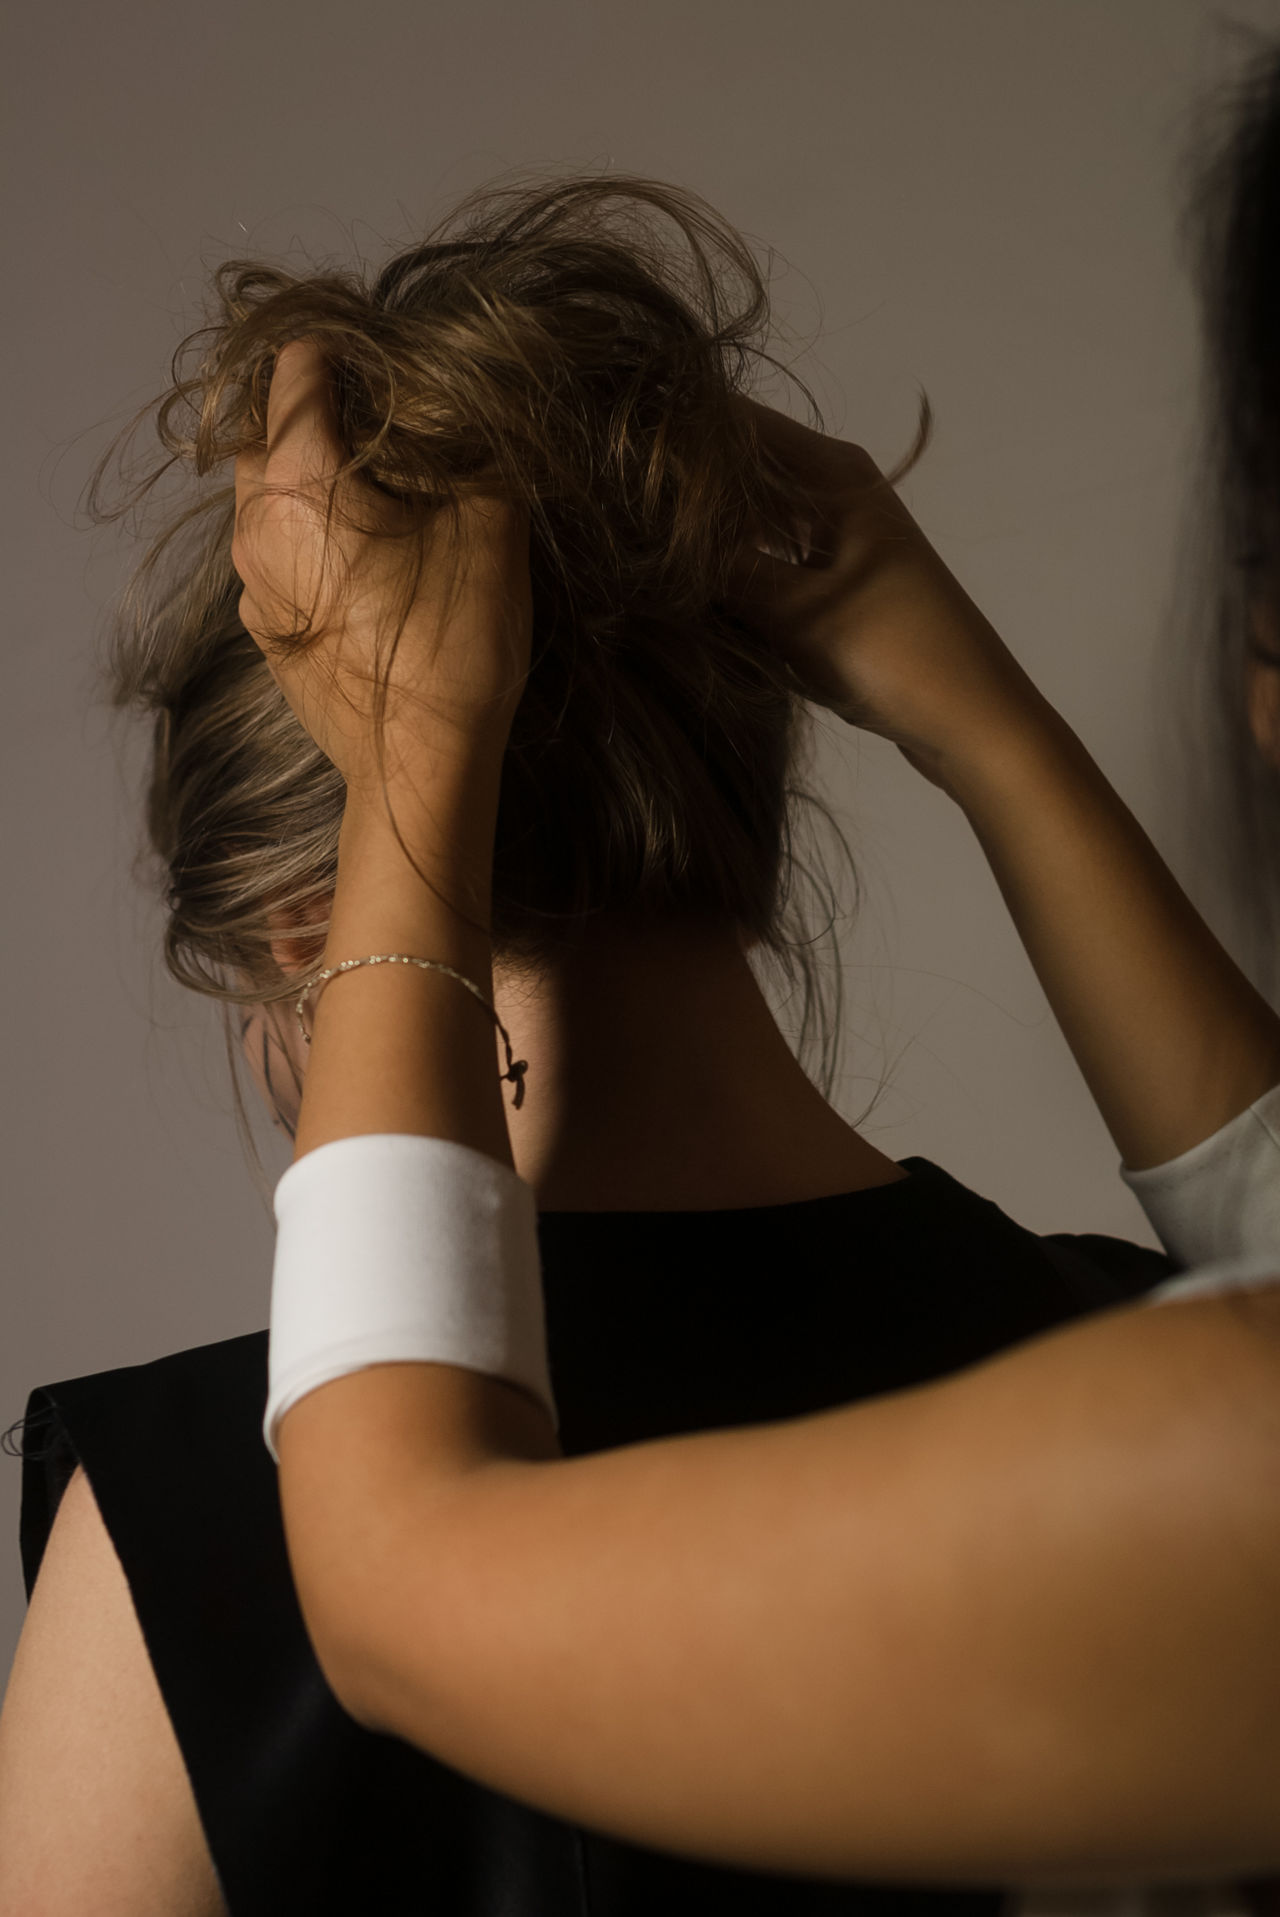 Backstage Beautiful Woman Close-up Clothes Czech Republic Fashion Hair Liberec Studio Shot